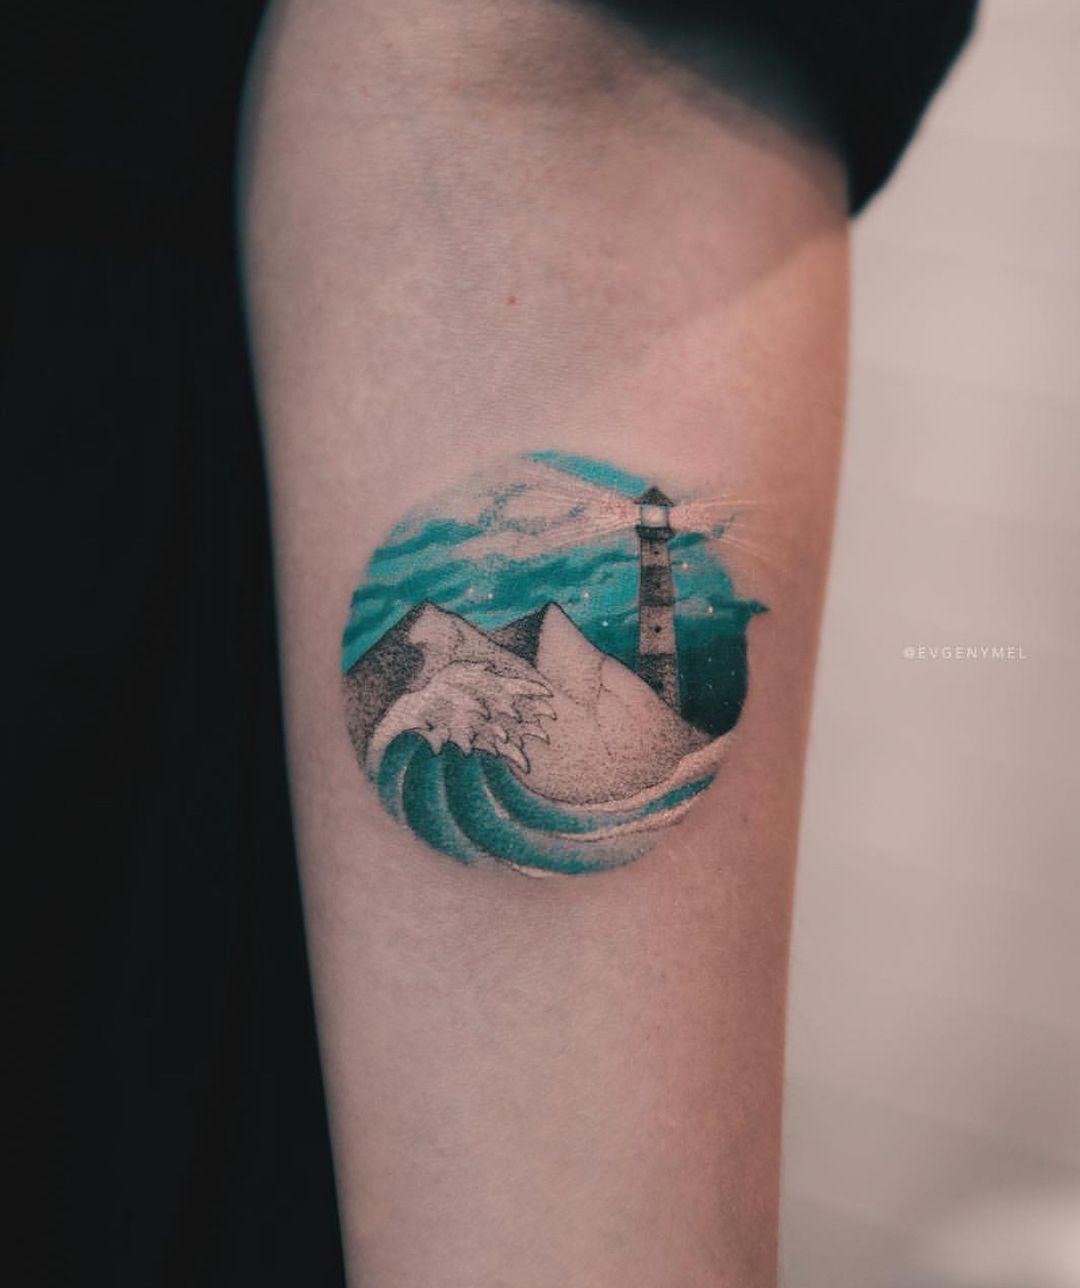 Tatuajes Originales Con Mucho Color Encuentra El Ideal Para Decorar Tu Piel Tattoo Tatuajes Tatuajes Originales Tatuaje A Color Tatuaje Pequeno Para Hombre